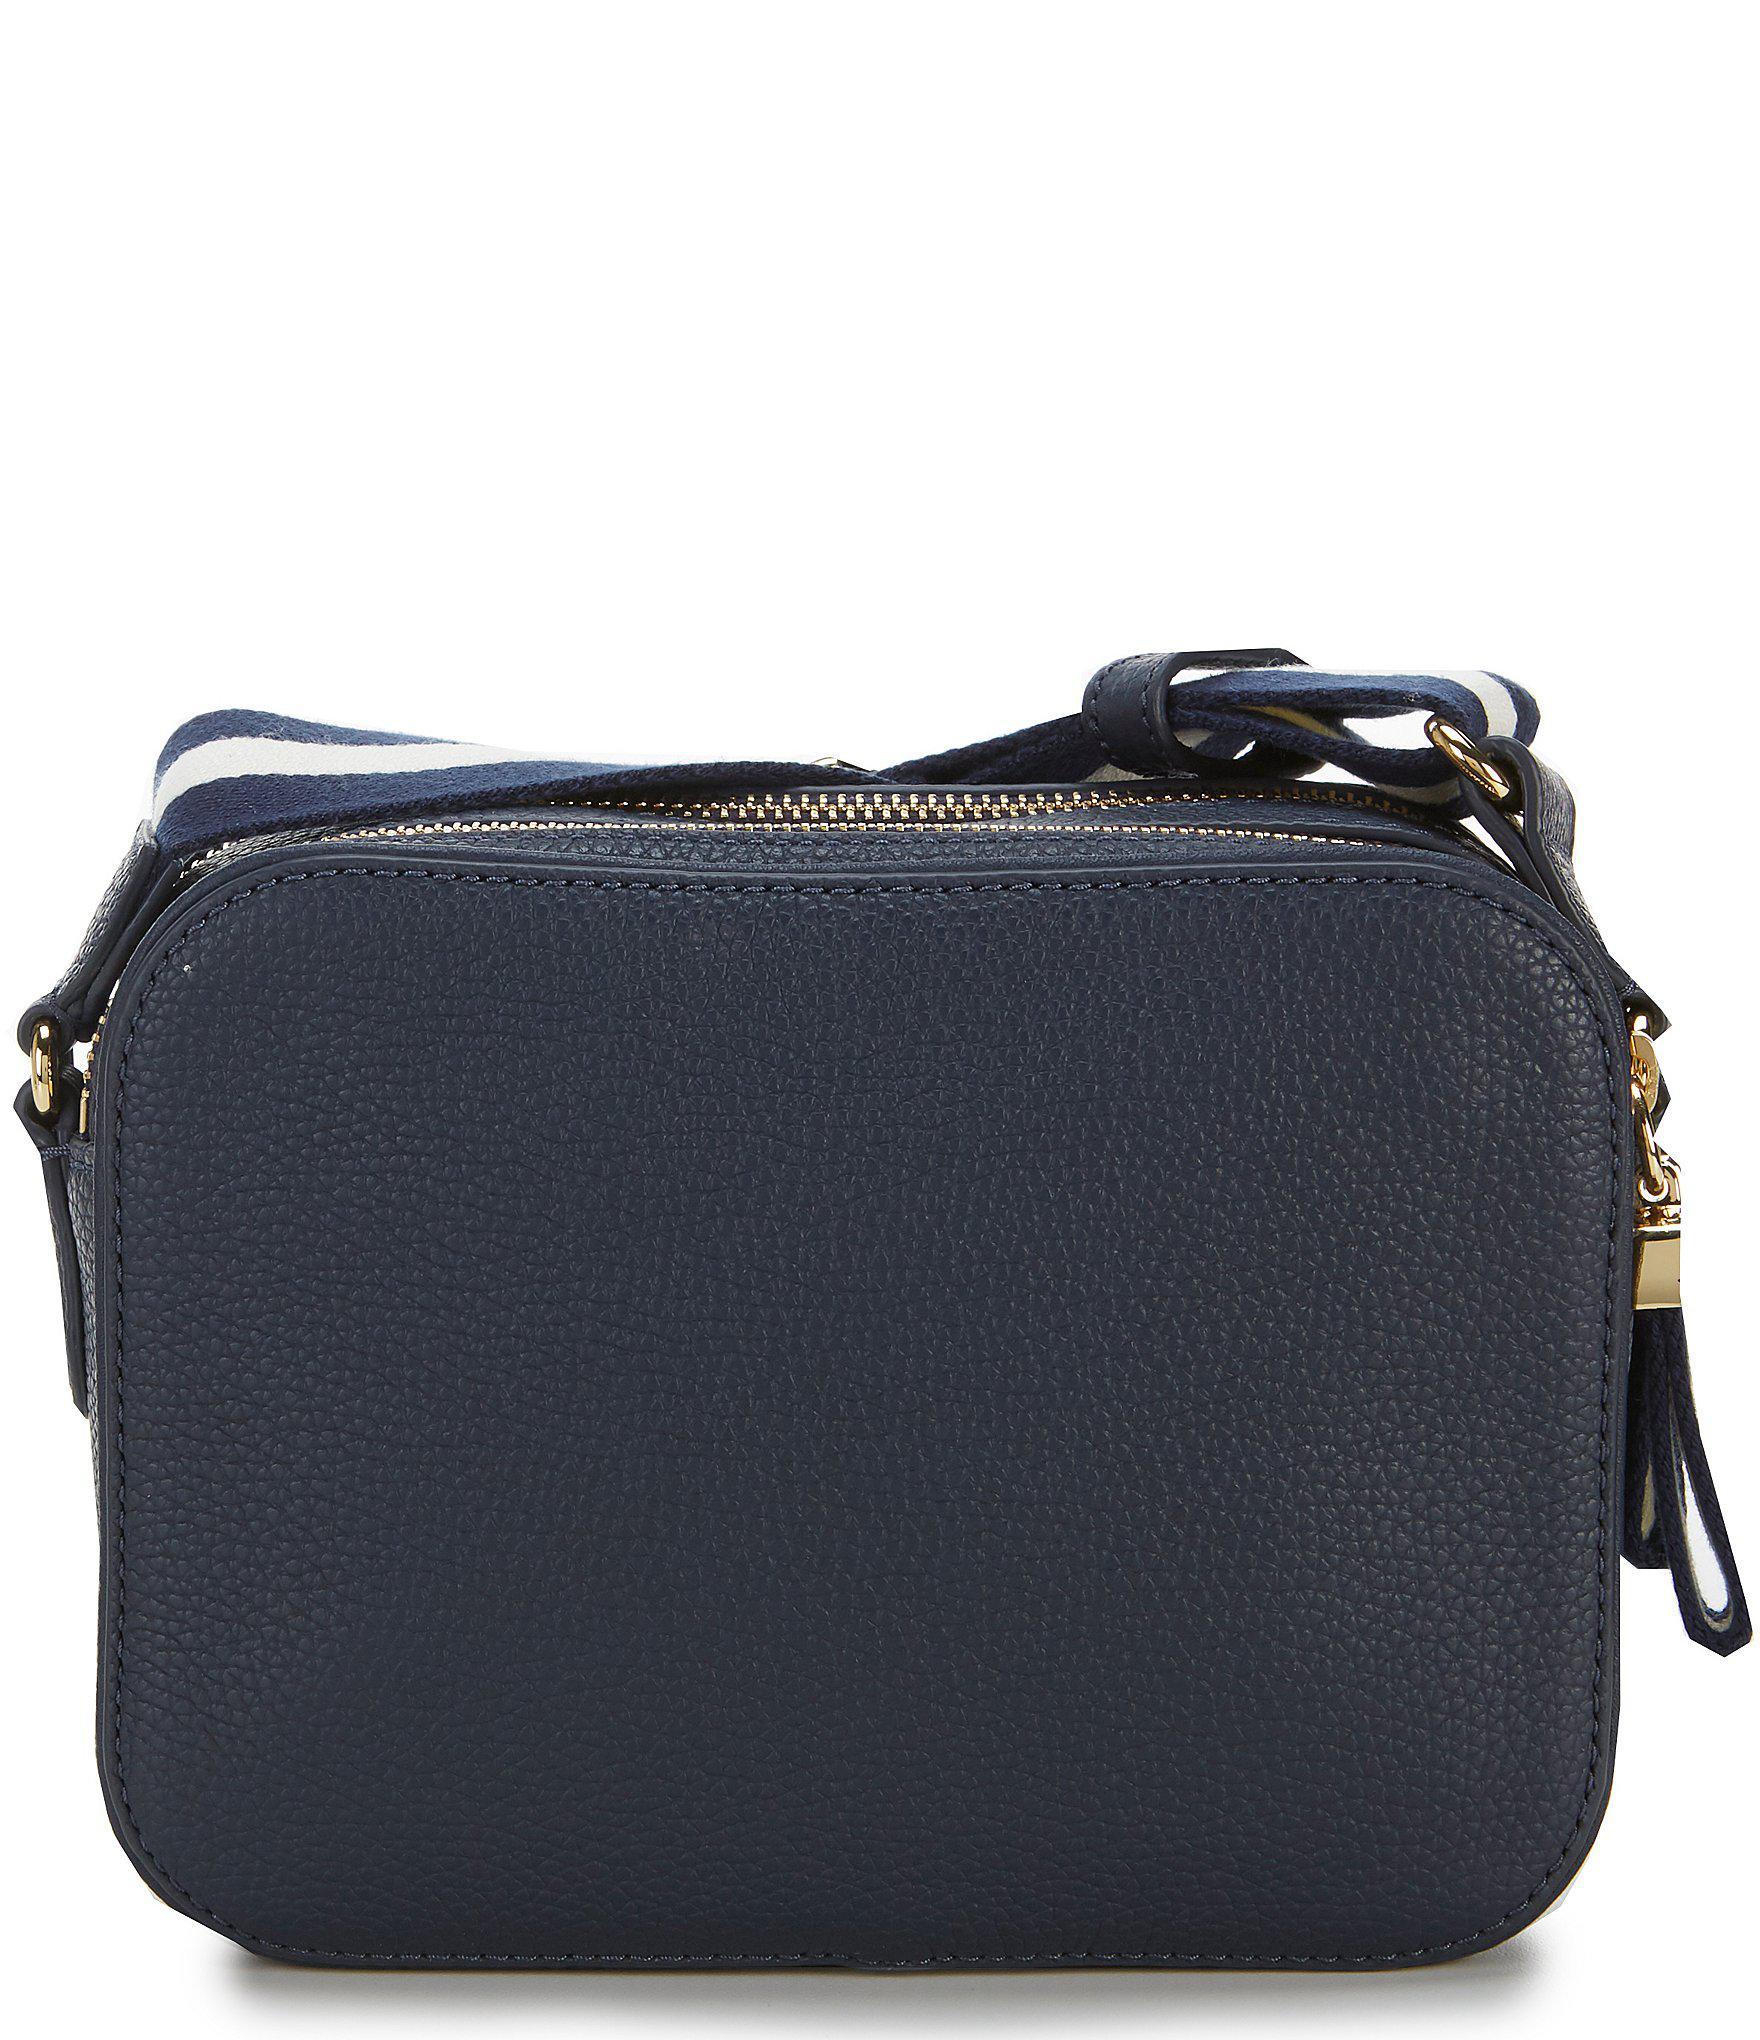 Lyst - Lauren by Ralph Lauren Cross-body Bag in Blue 82a25484aa